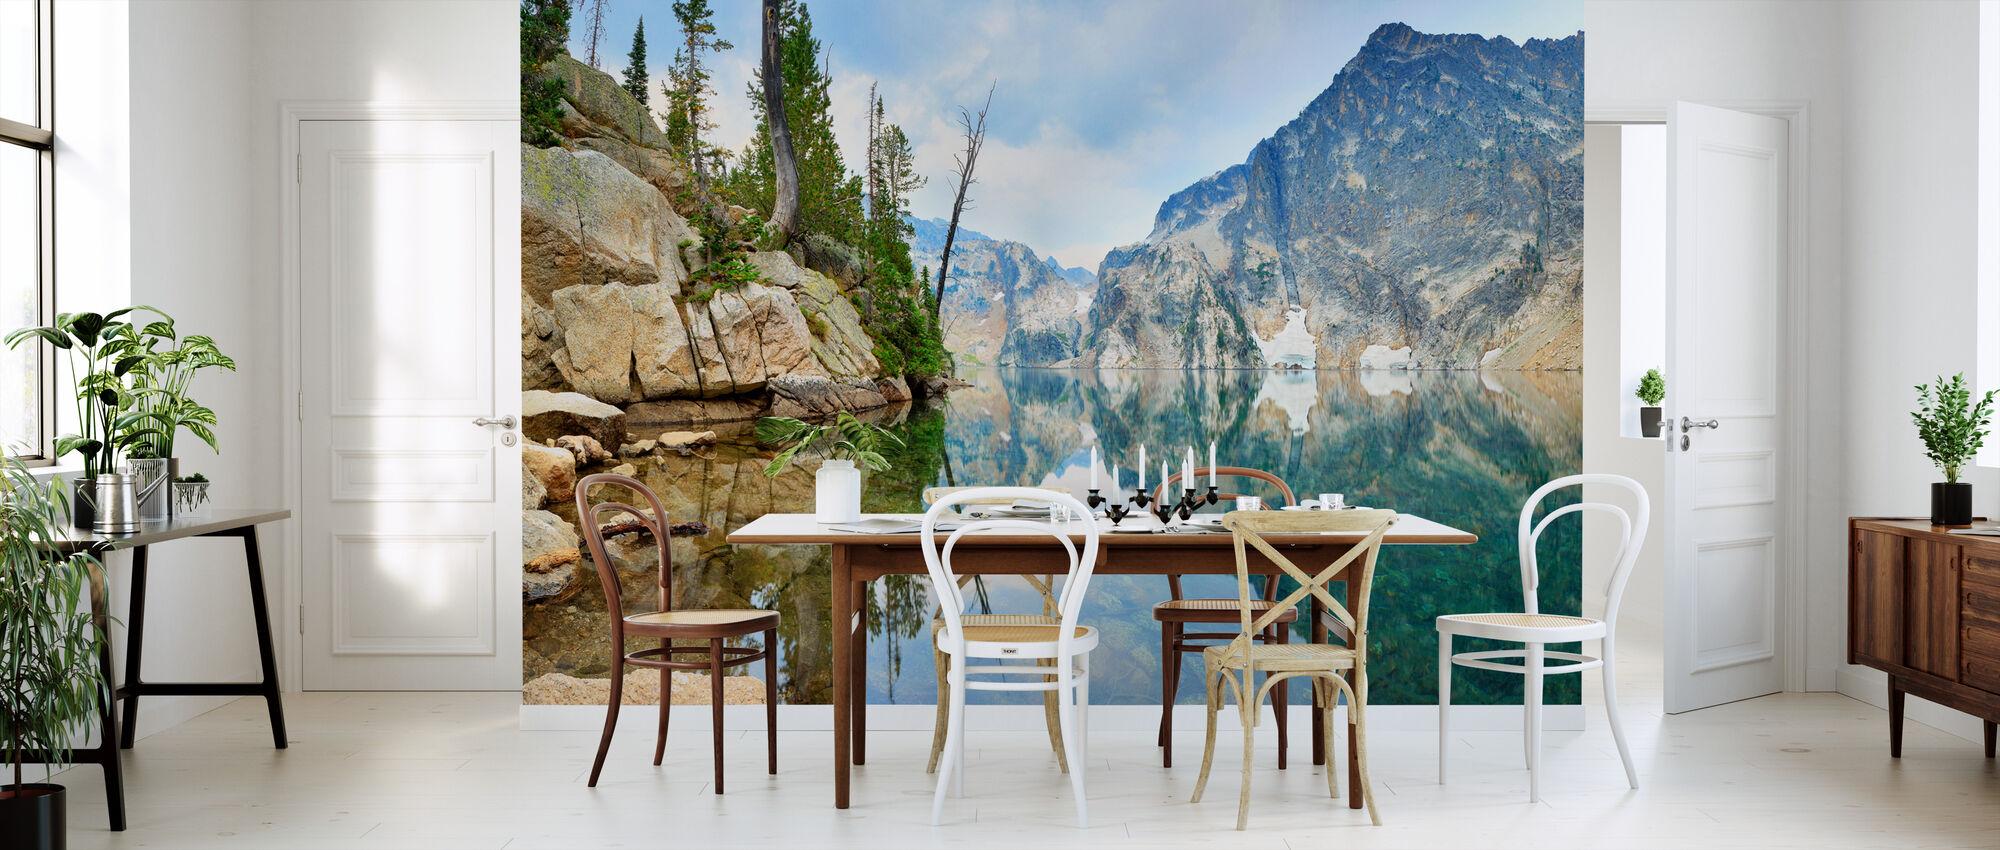 Mountain Lake with Mirror Reflection - Wallpaper - Kitchen